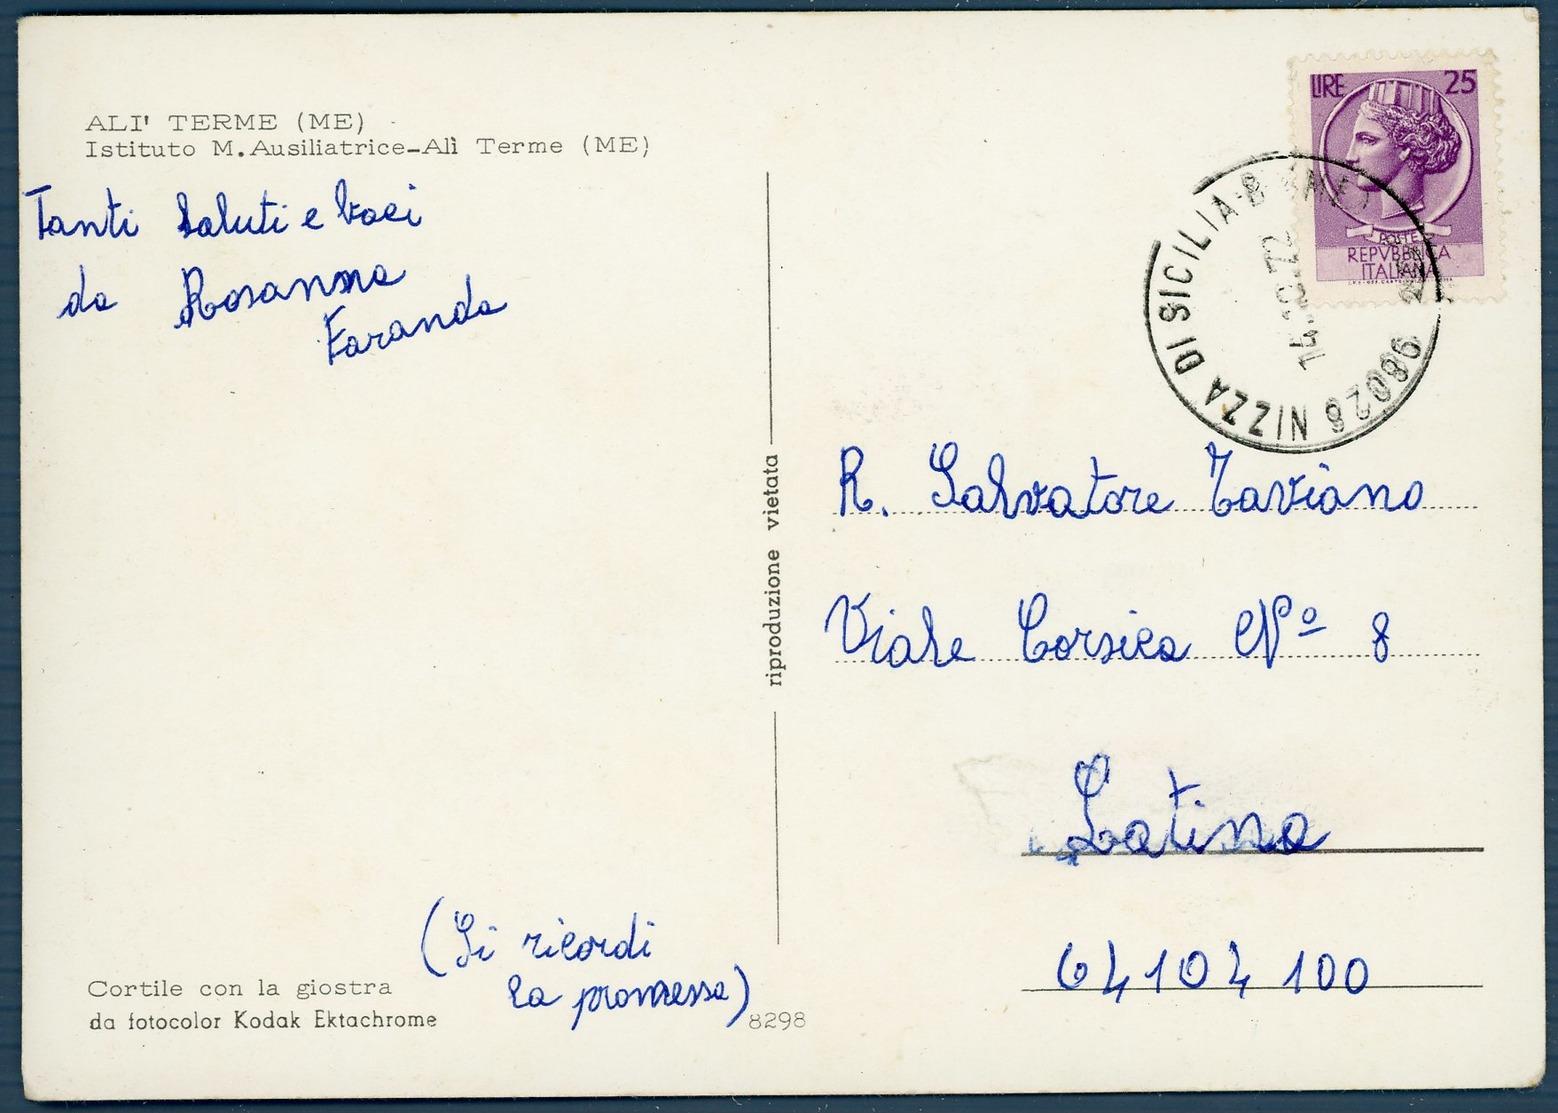 °°° Cartolina N. 12 Alì Terme Istituto M. Ausiliatrice Viaggiata °°° - Messina